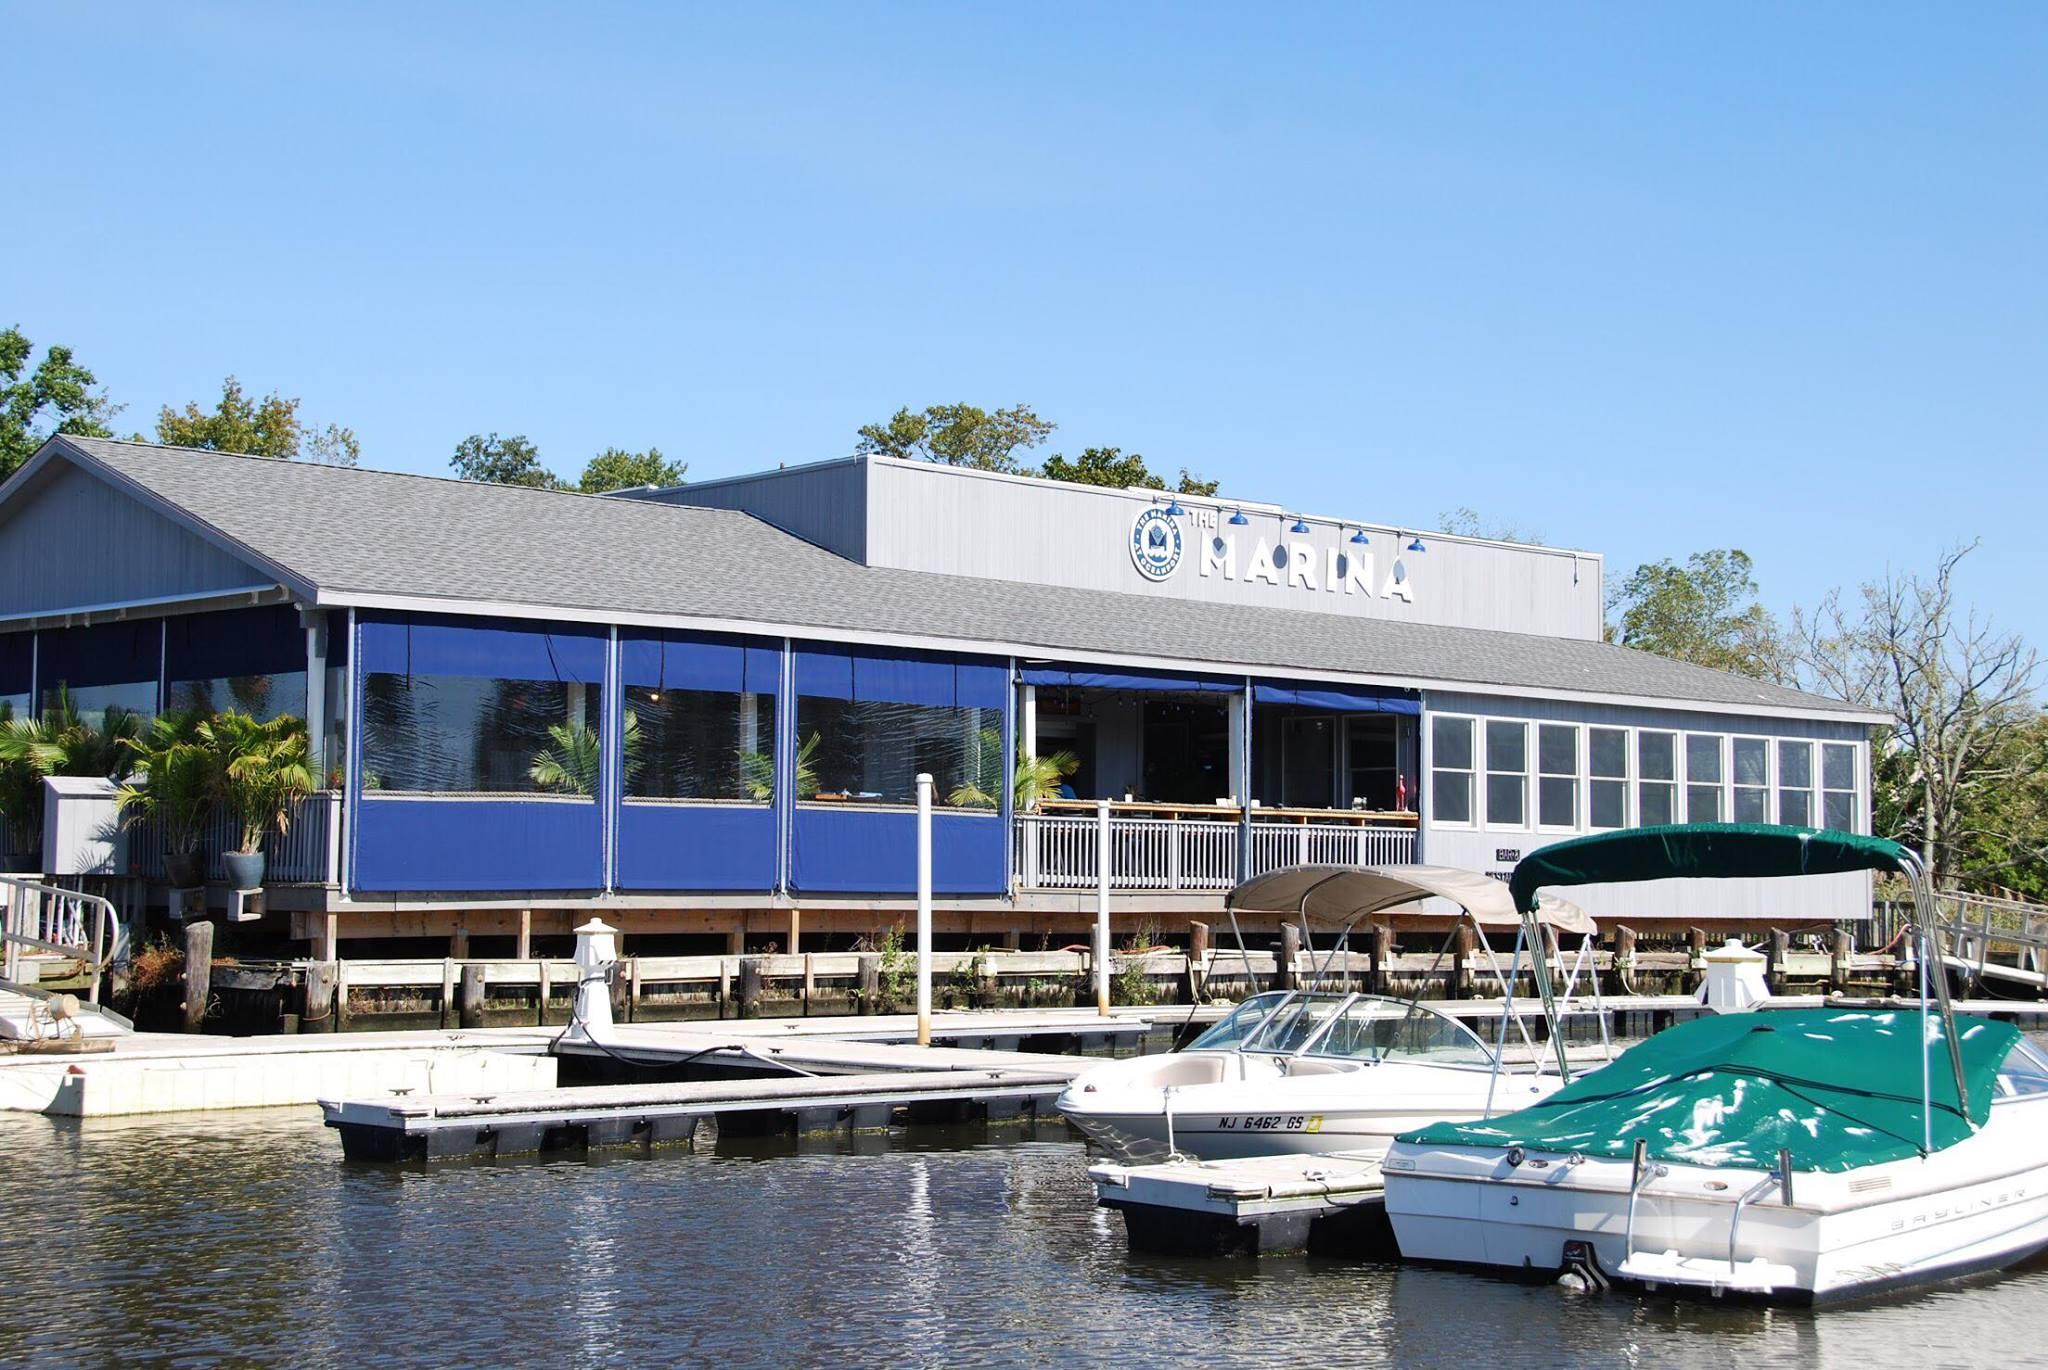 The Marina at Oceanport